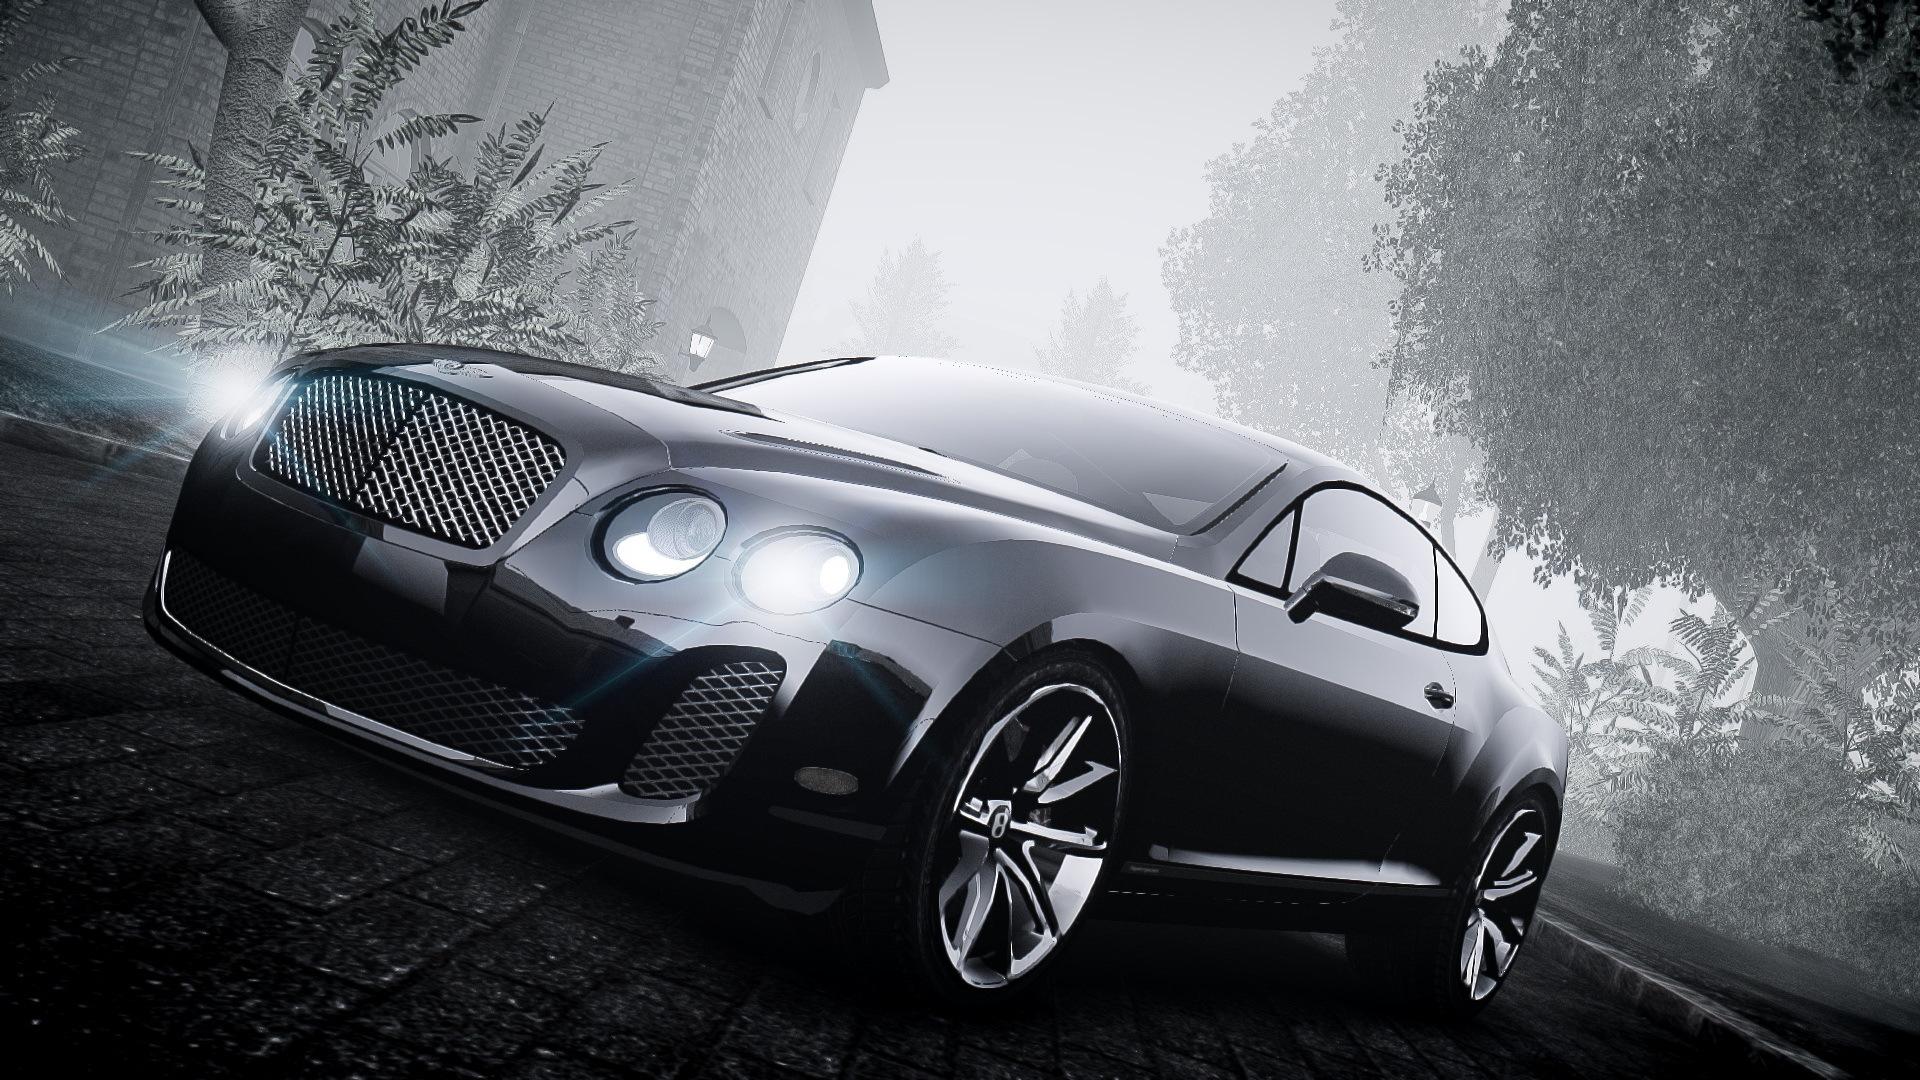 Cars Wallpapers: Bentley Wallpapers Wallpapers High Quality